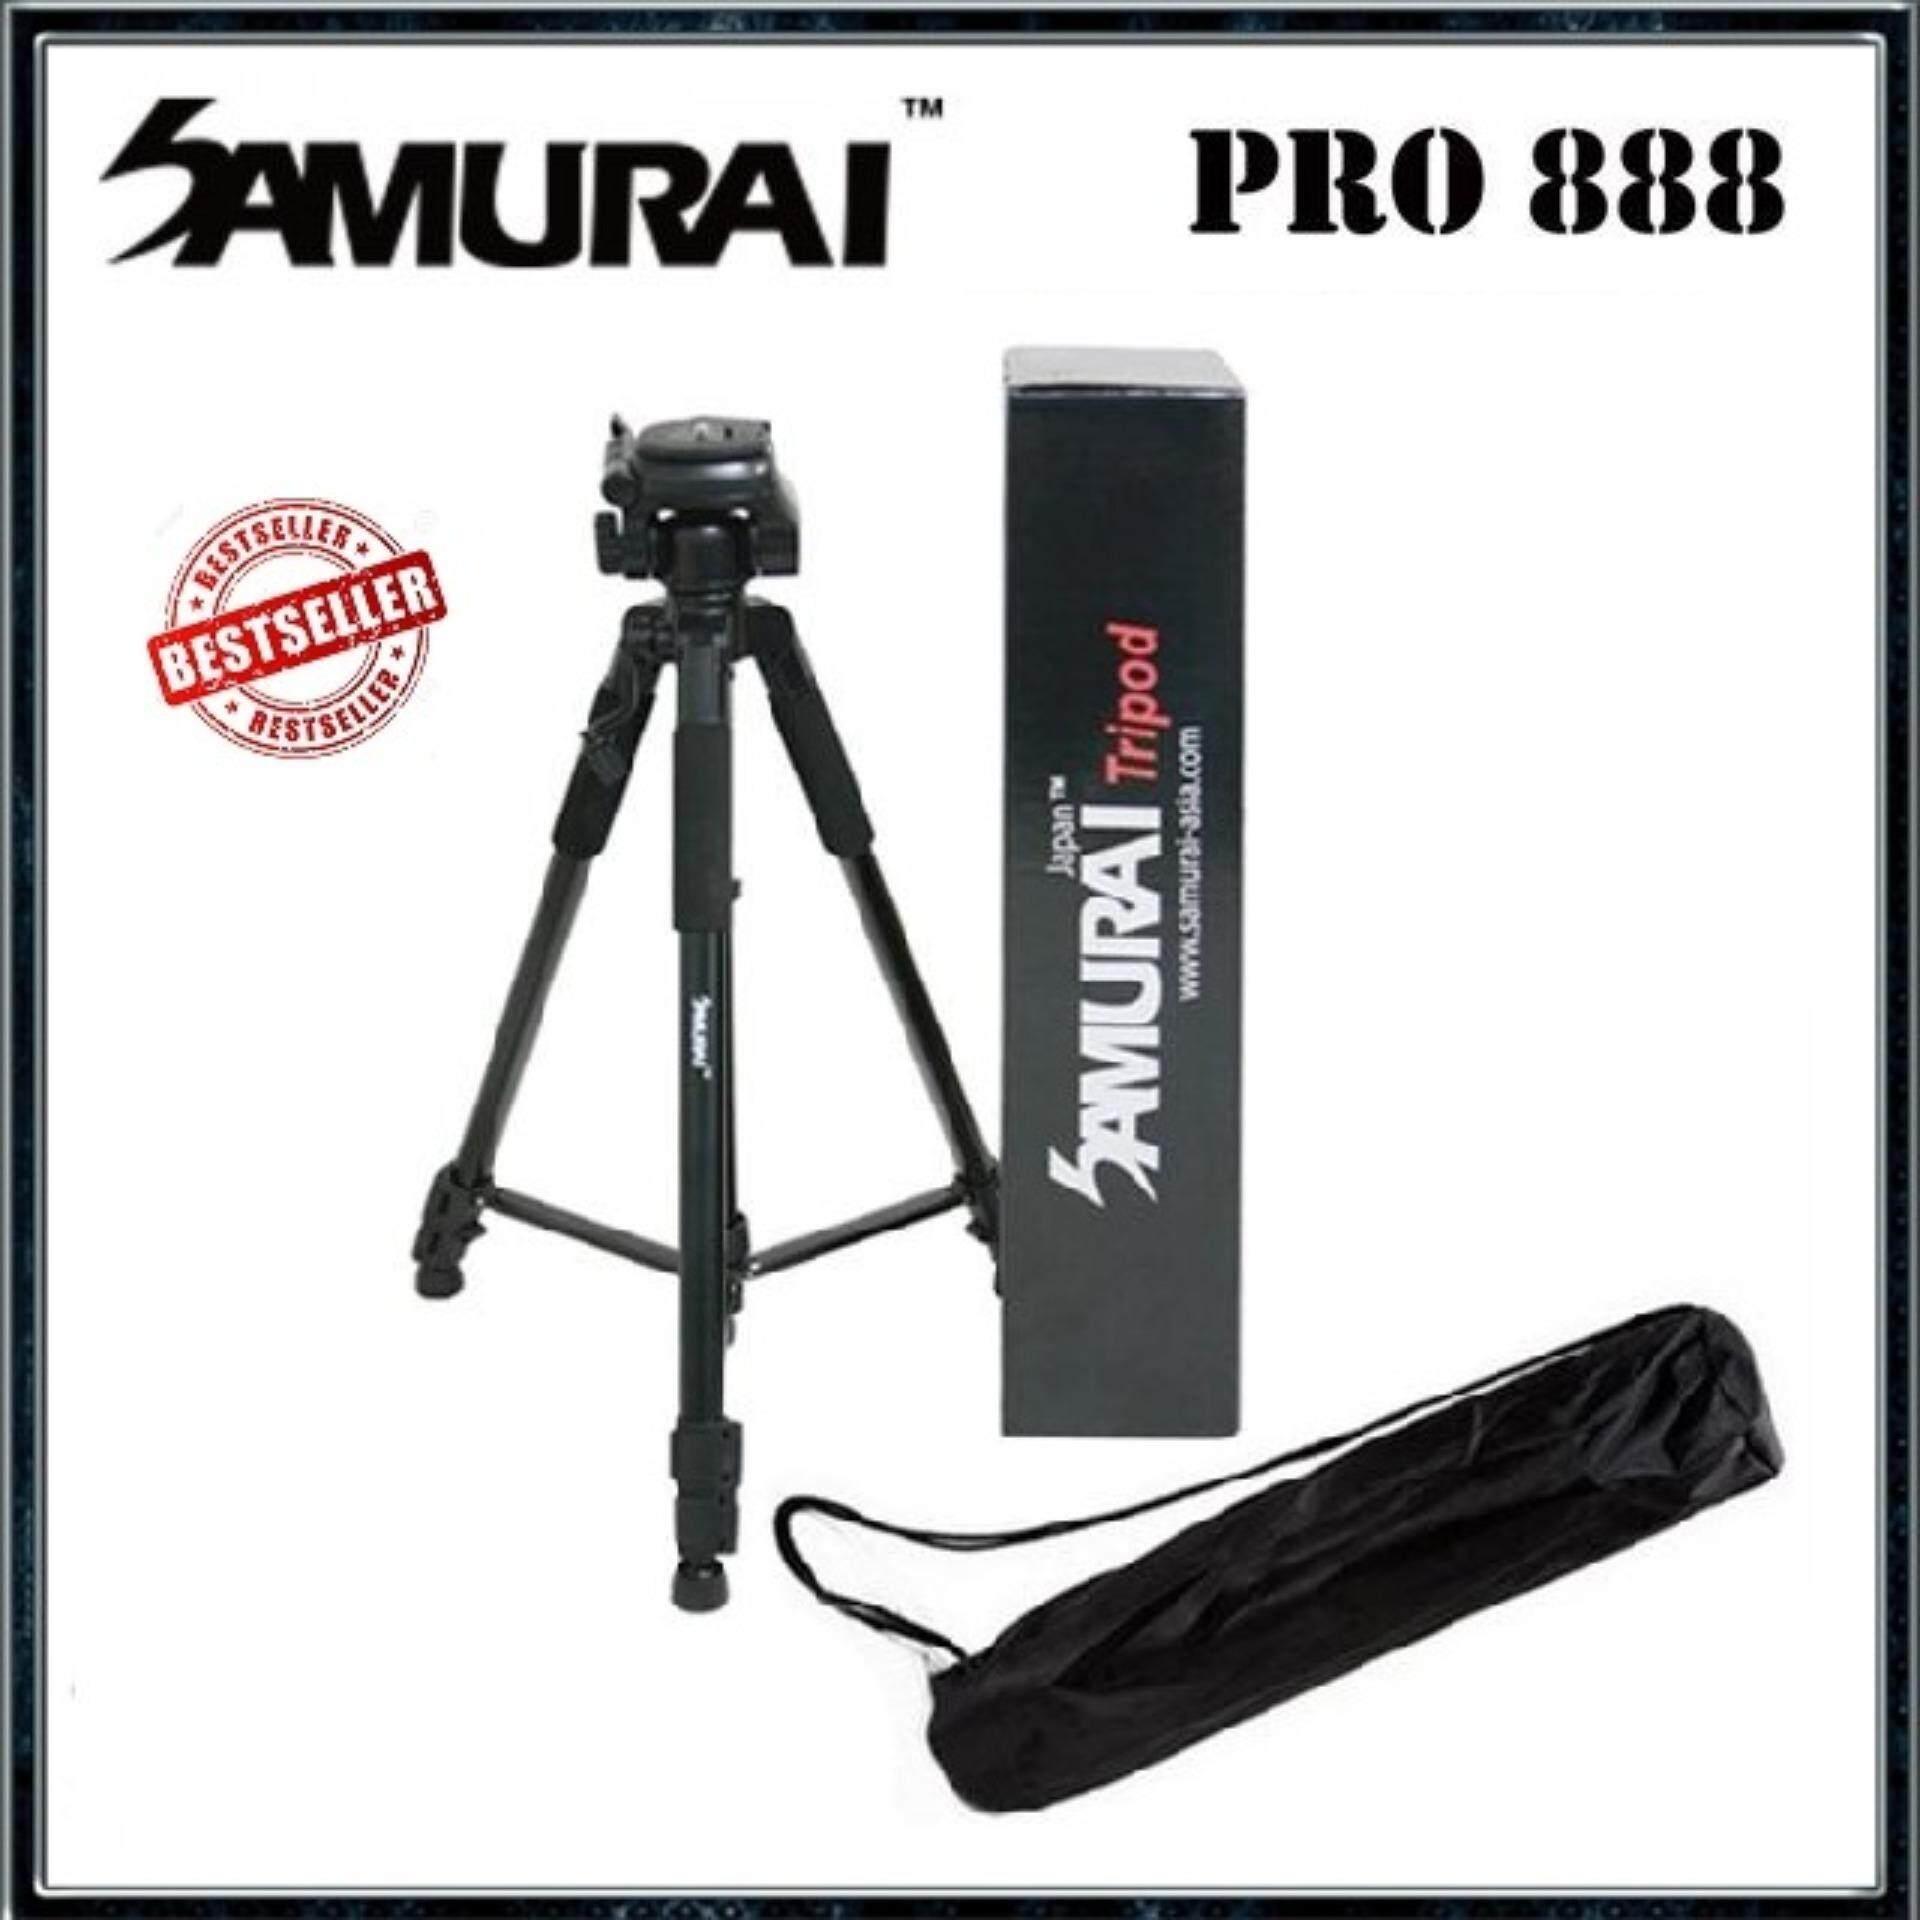 Samurai Pro888 BLACK Aluminum light weight Tripod Free Pouch